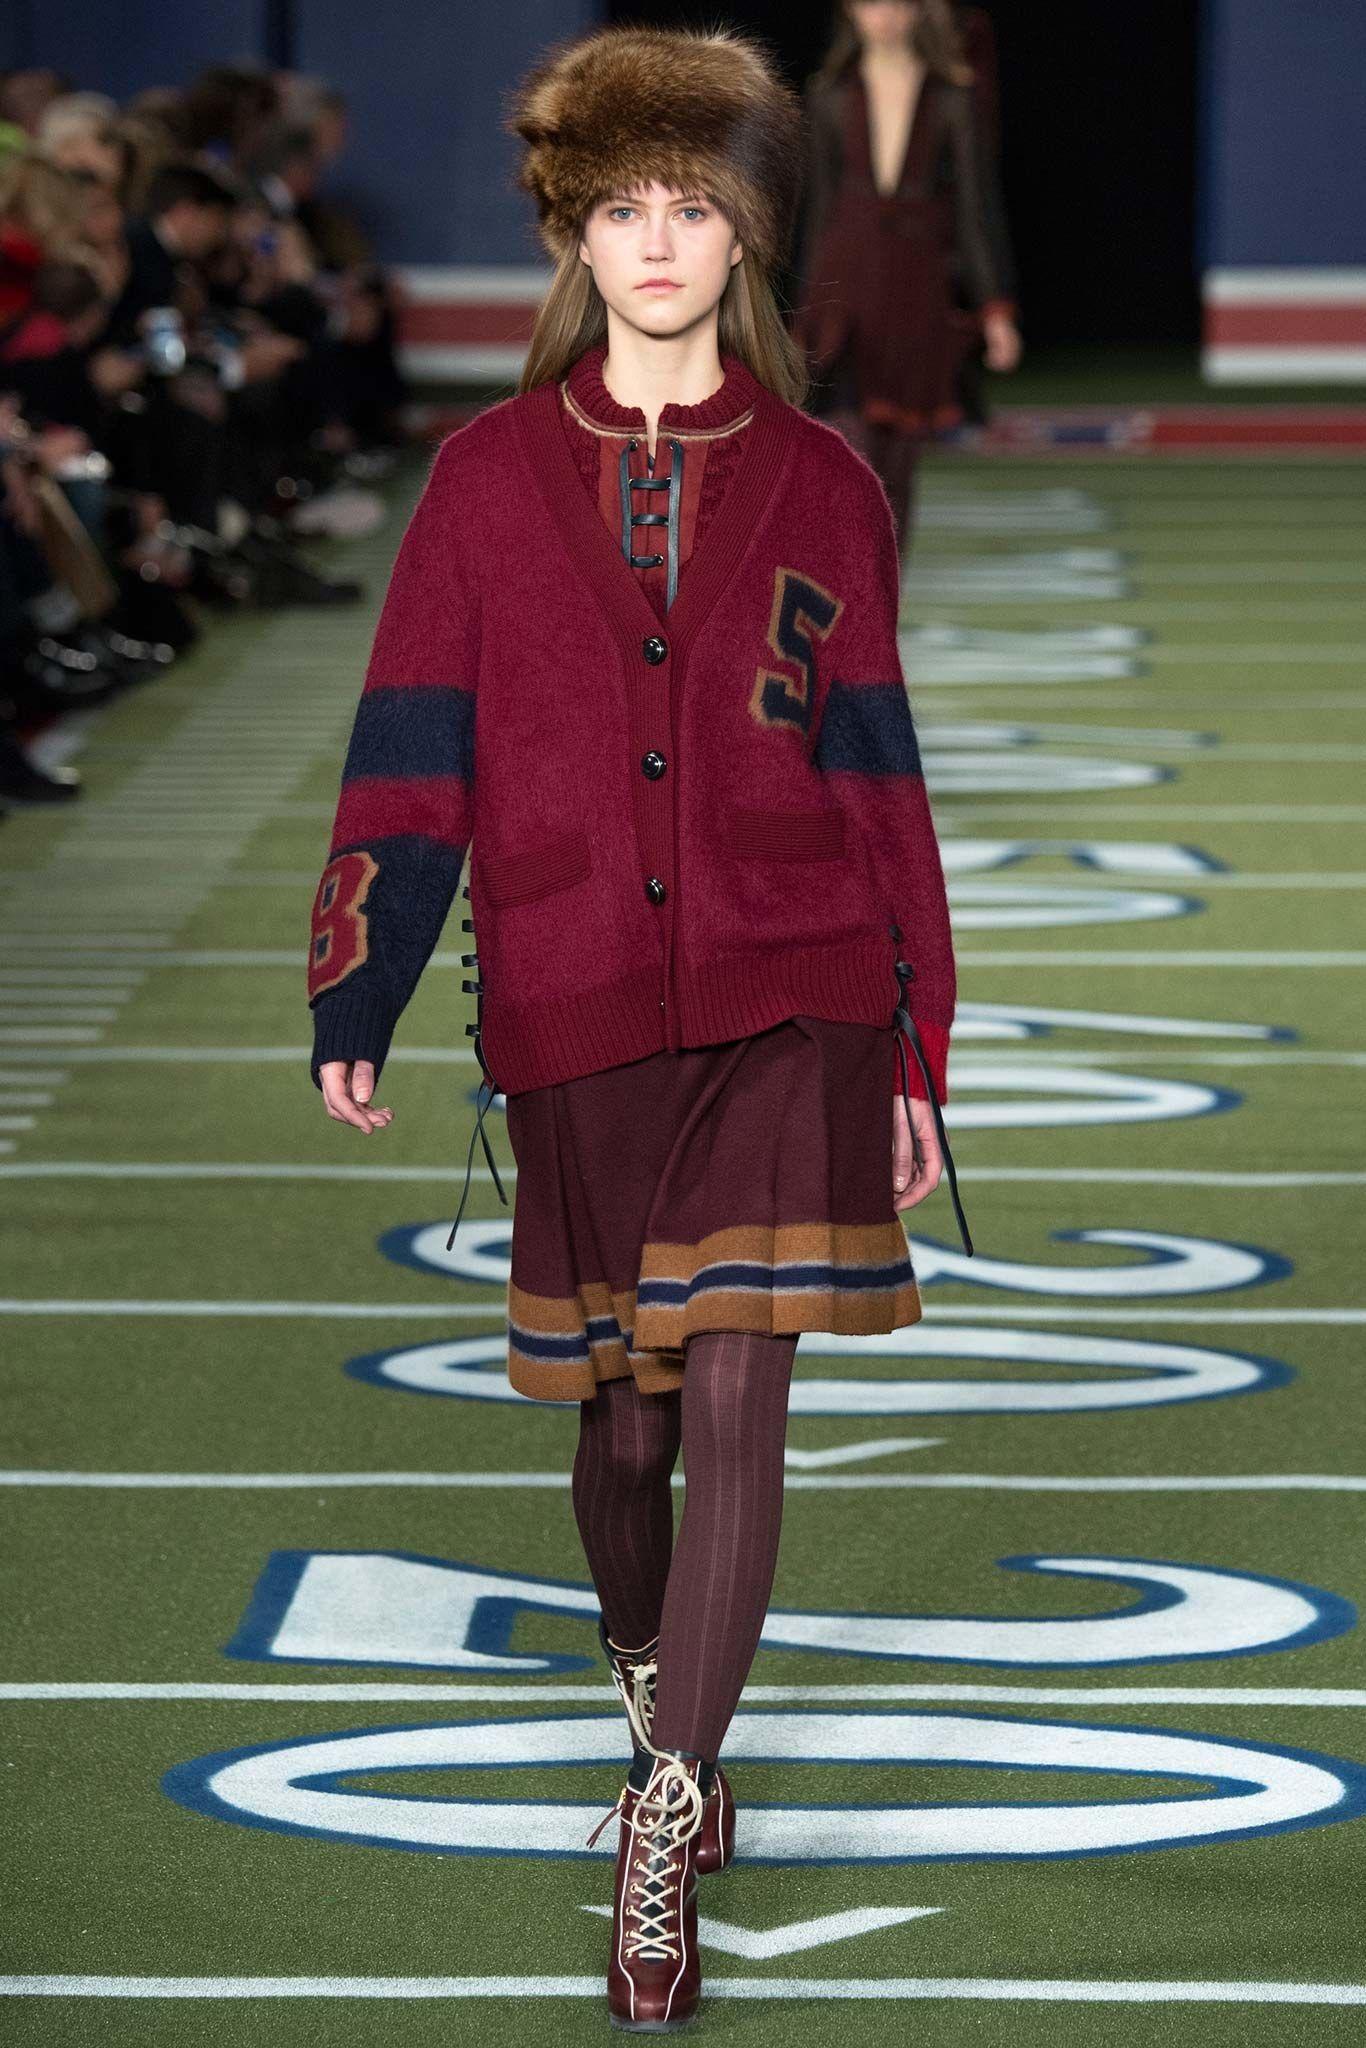 Tommy Hilfiger Fall 2015 Ready-to-Wear Fashion Show